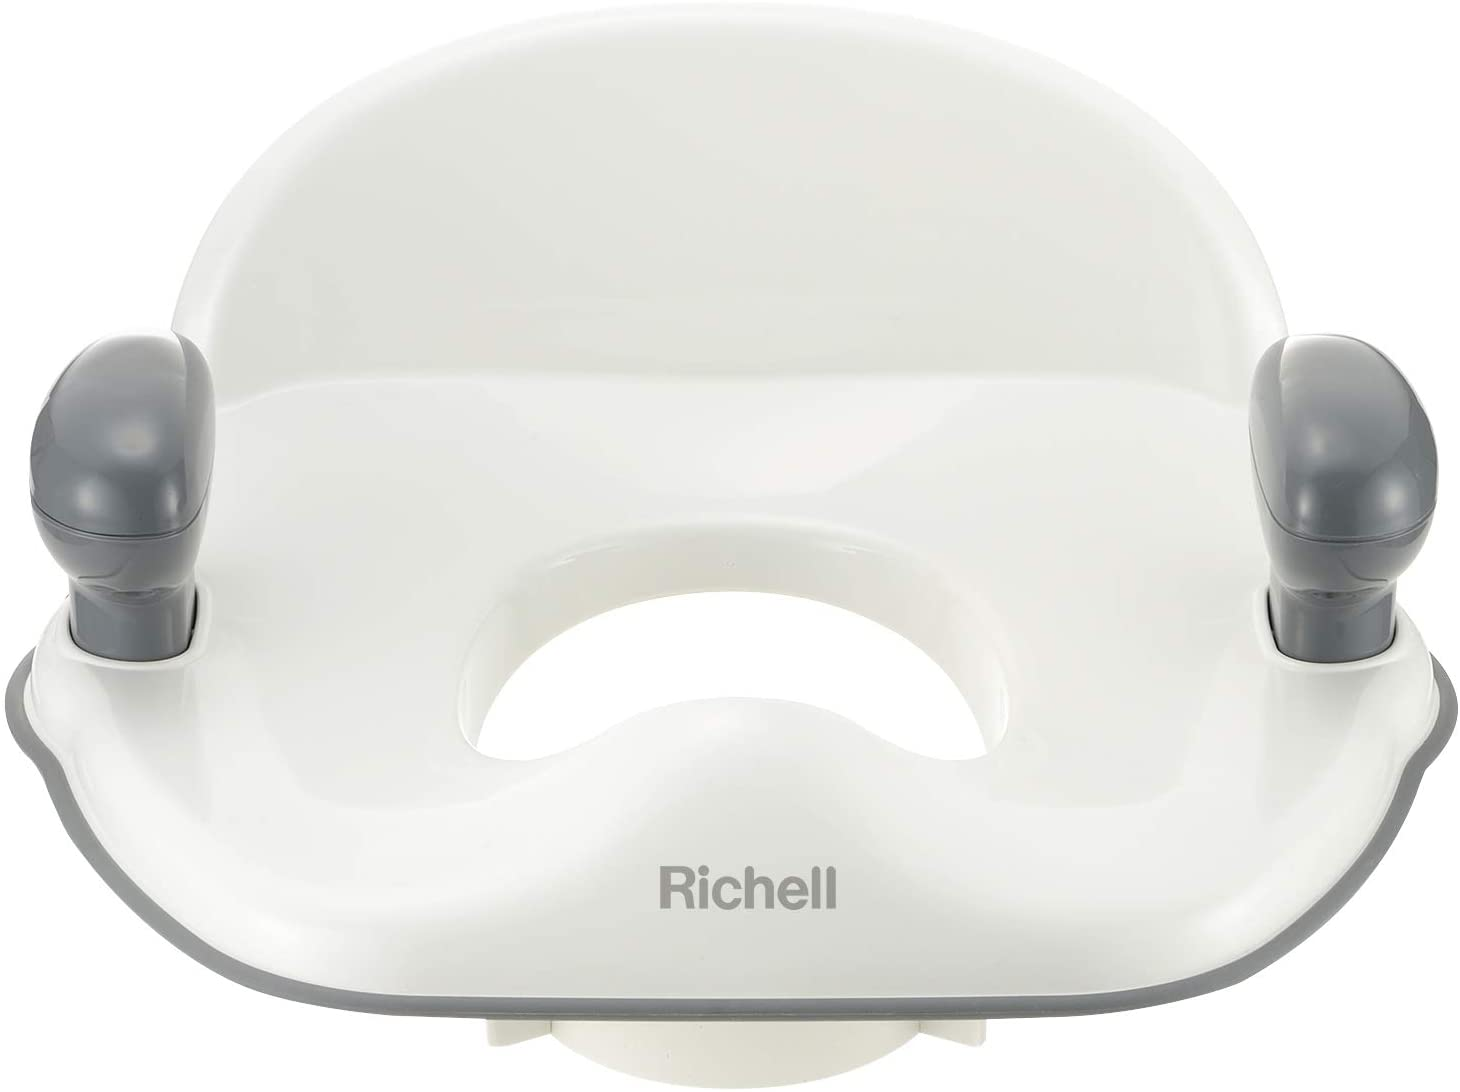 Richell(リッチェル) ポッティス 補助便座Kの商品画像2